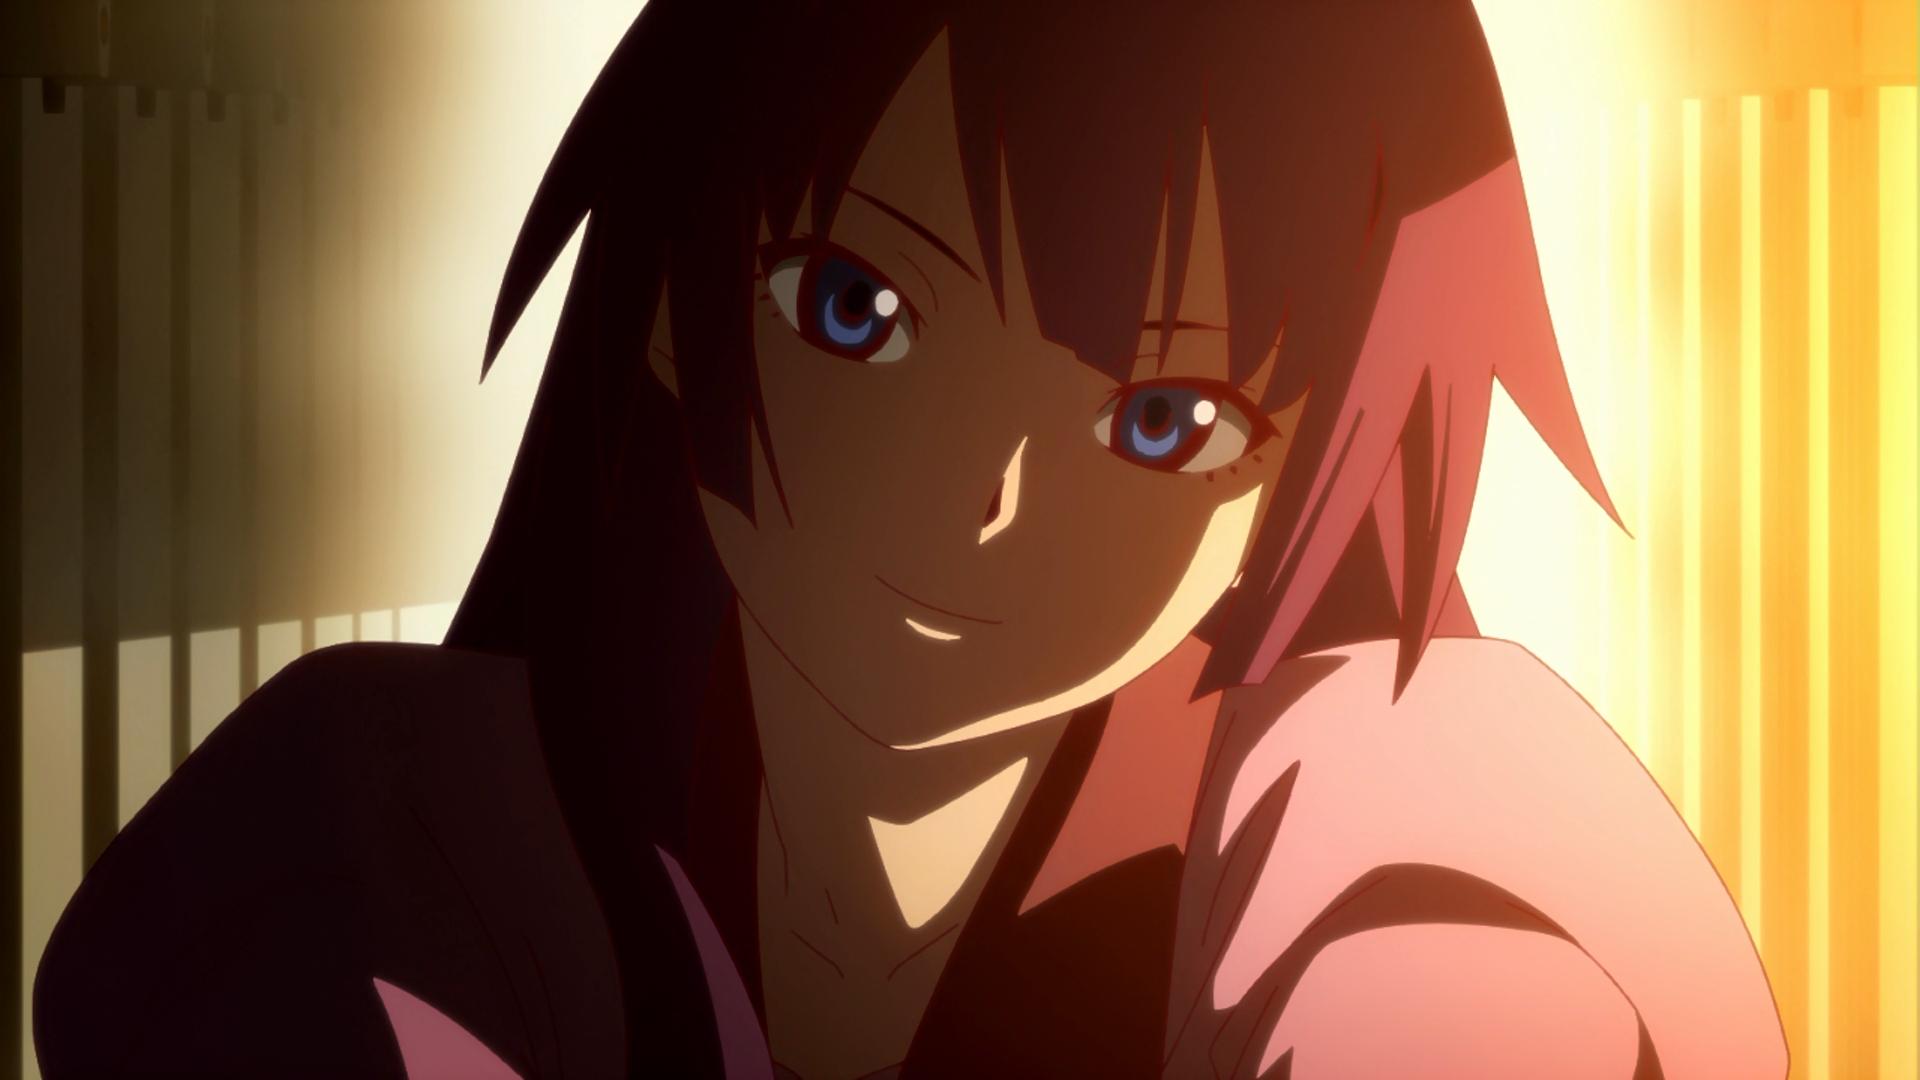 Senjougahara Hitagi【Bakemonogatari】 All anime characters